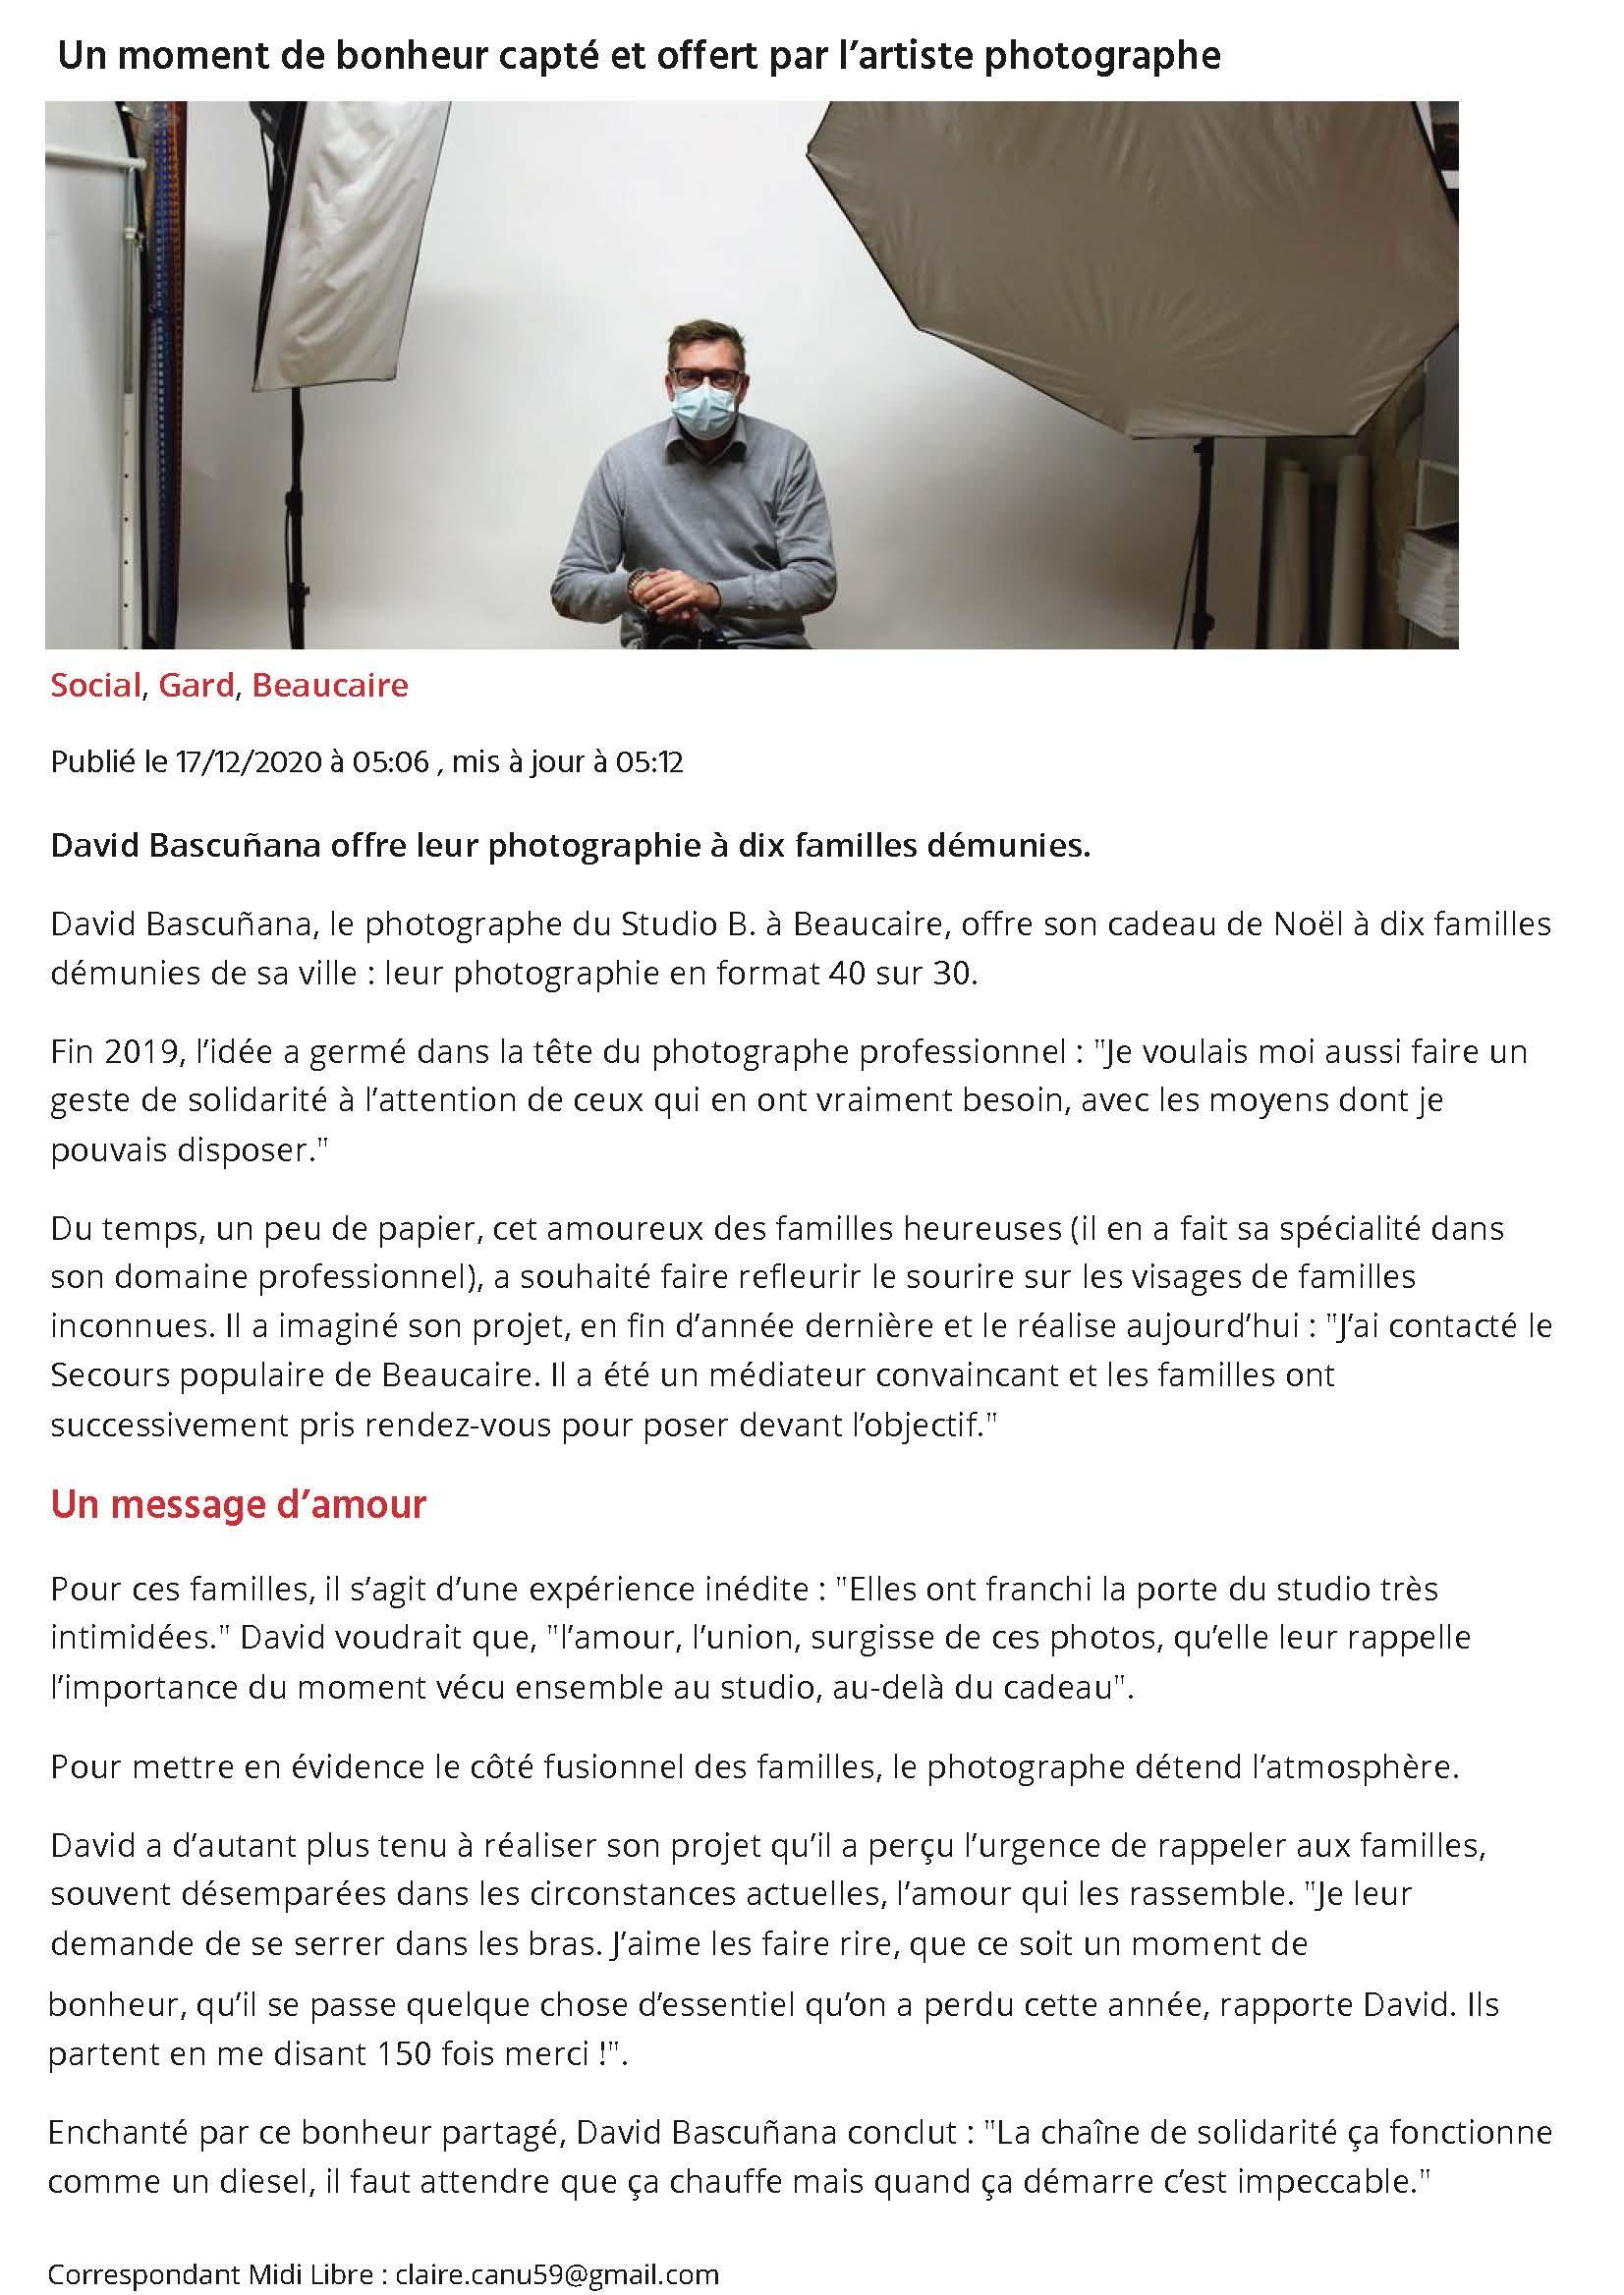 Studio B photographe beaucaire